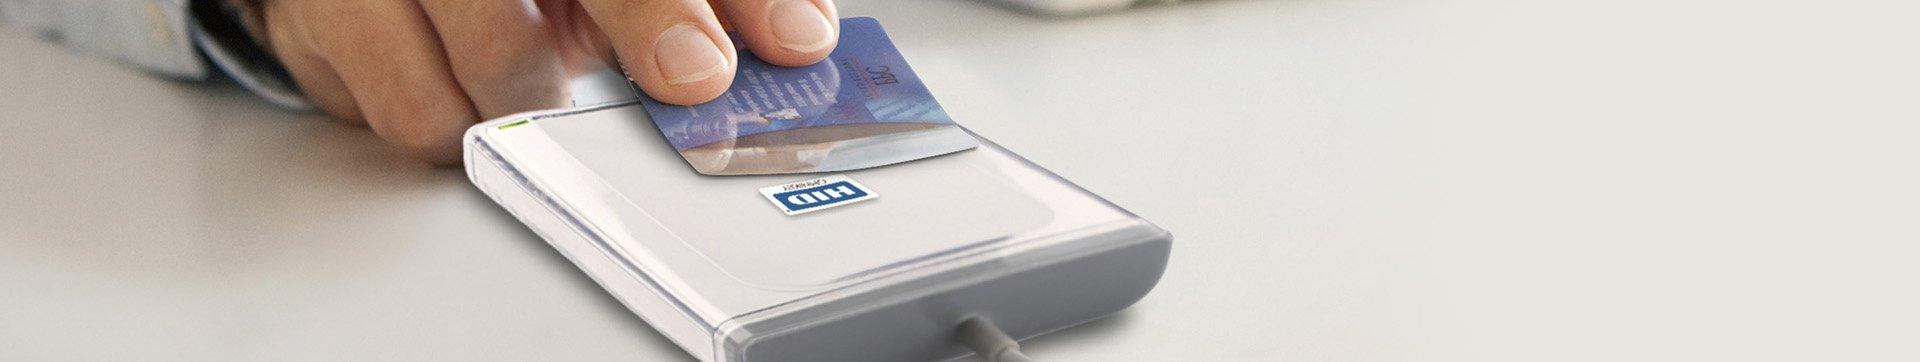 Kartice EM 4000 serija beskontaktna kartica